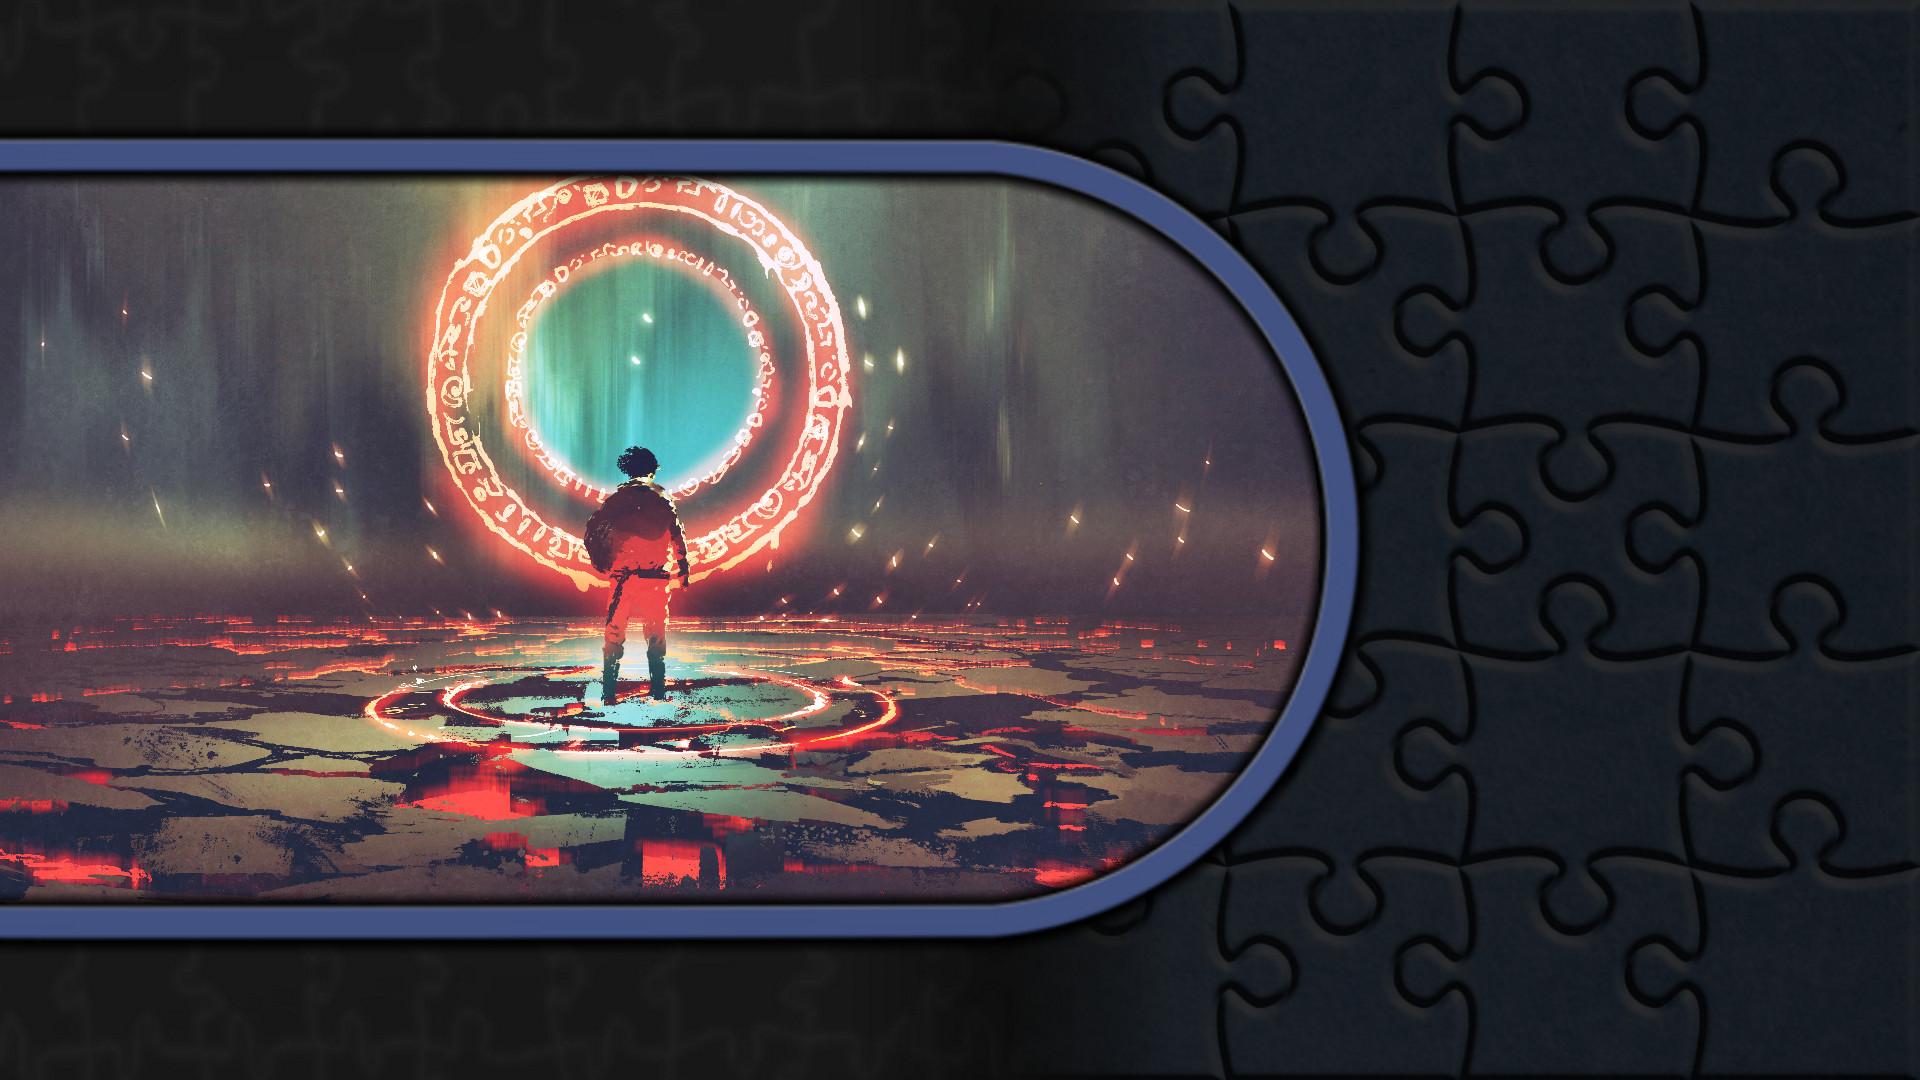 Pixel Puzzles Illustrations & Anime - Jigsaw Pack: Horror screenshot